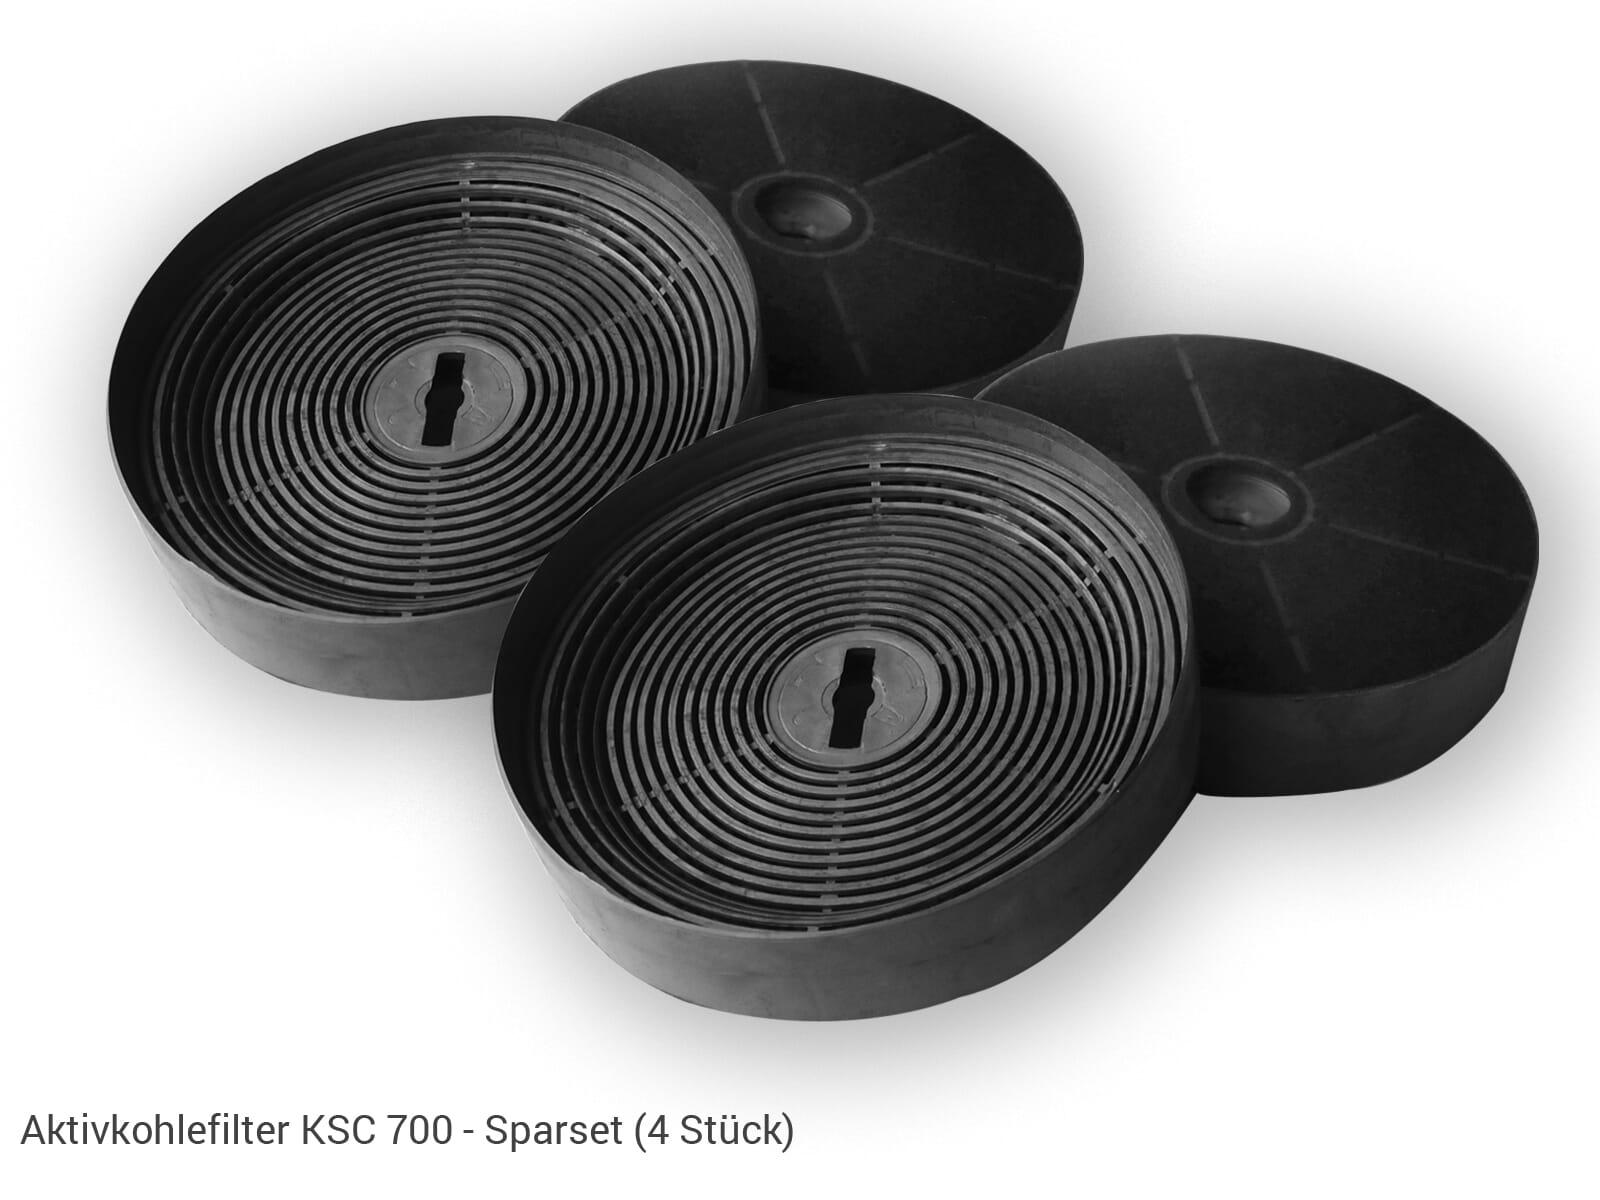 Oranier KSC 700 Aktiv-Kohlefilter Sparset (4 Stück)